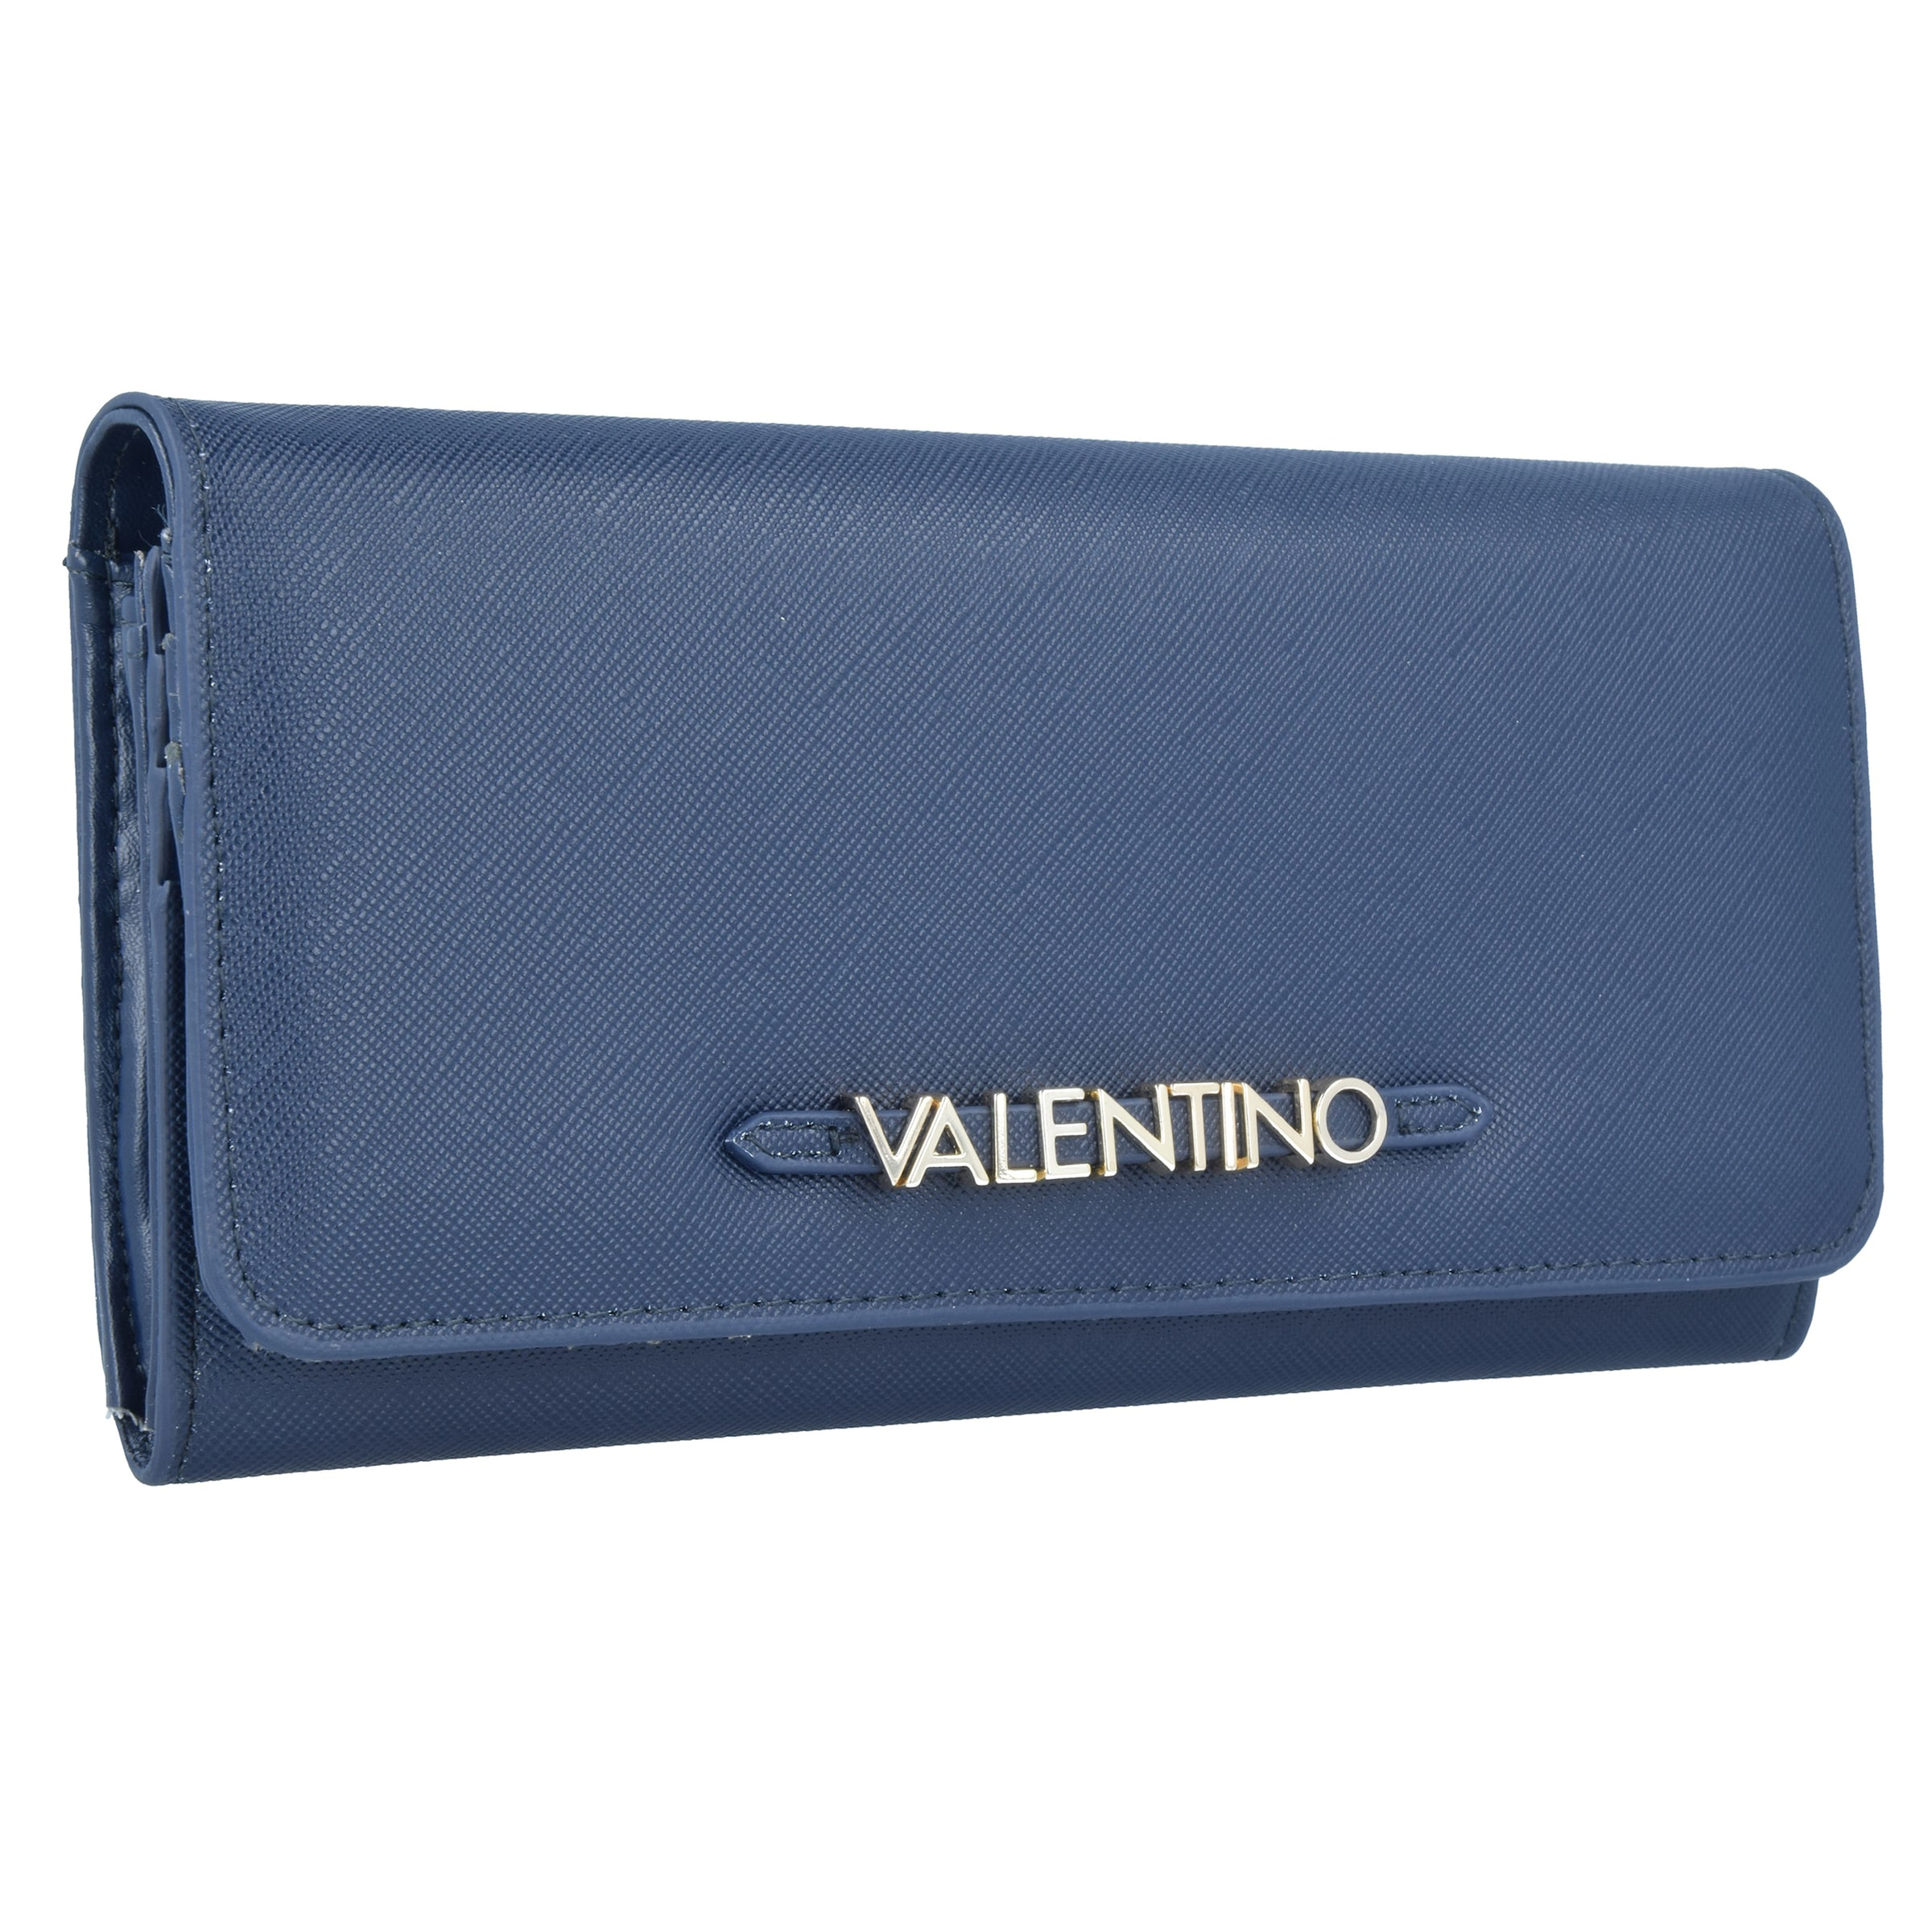 Valentino Handbags Sea Geldbörse 19,5 cm